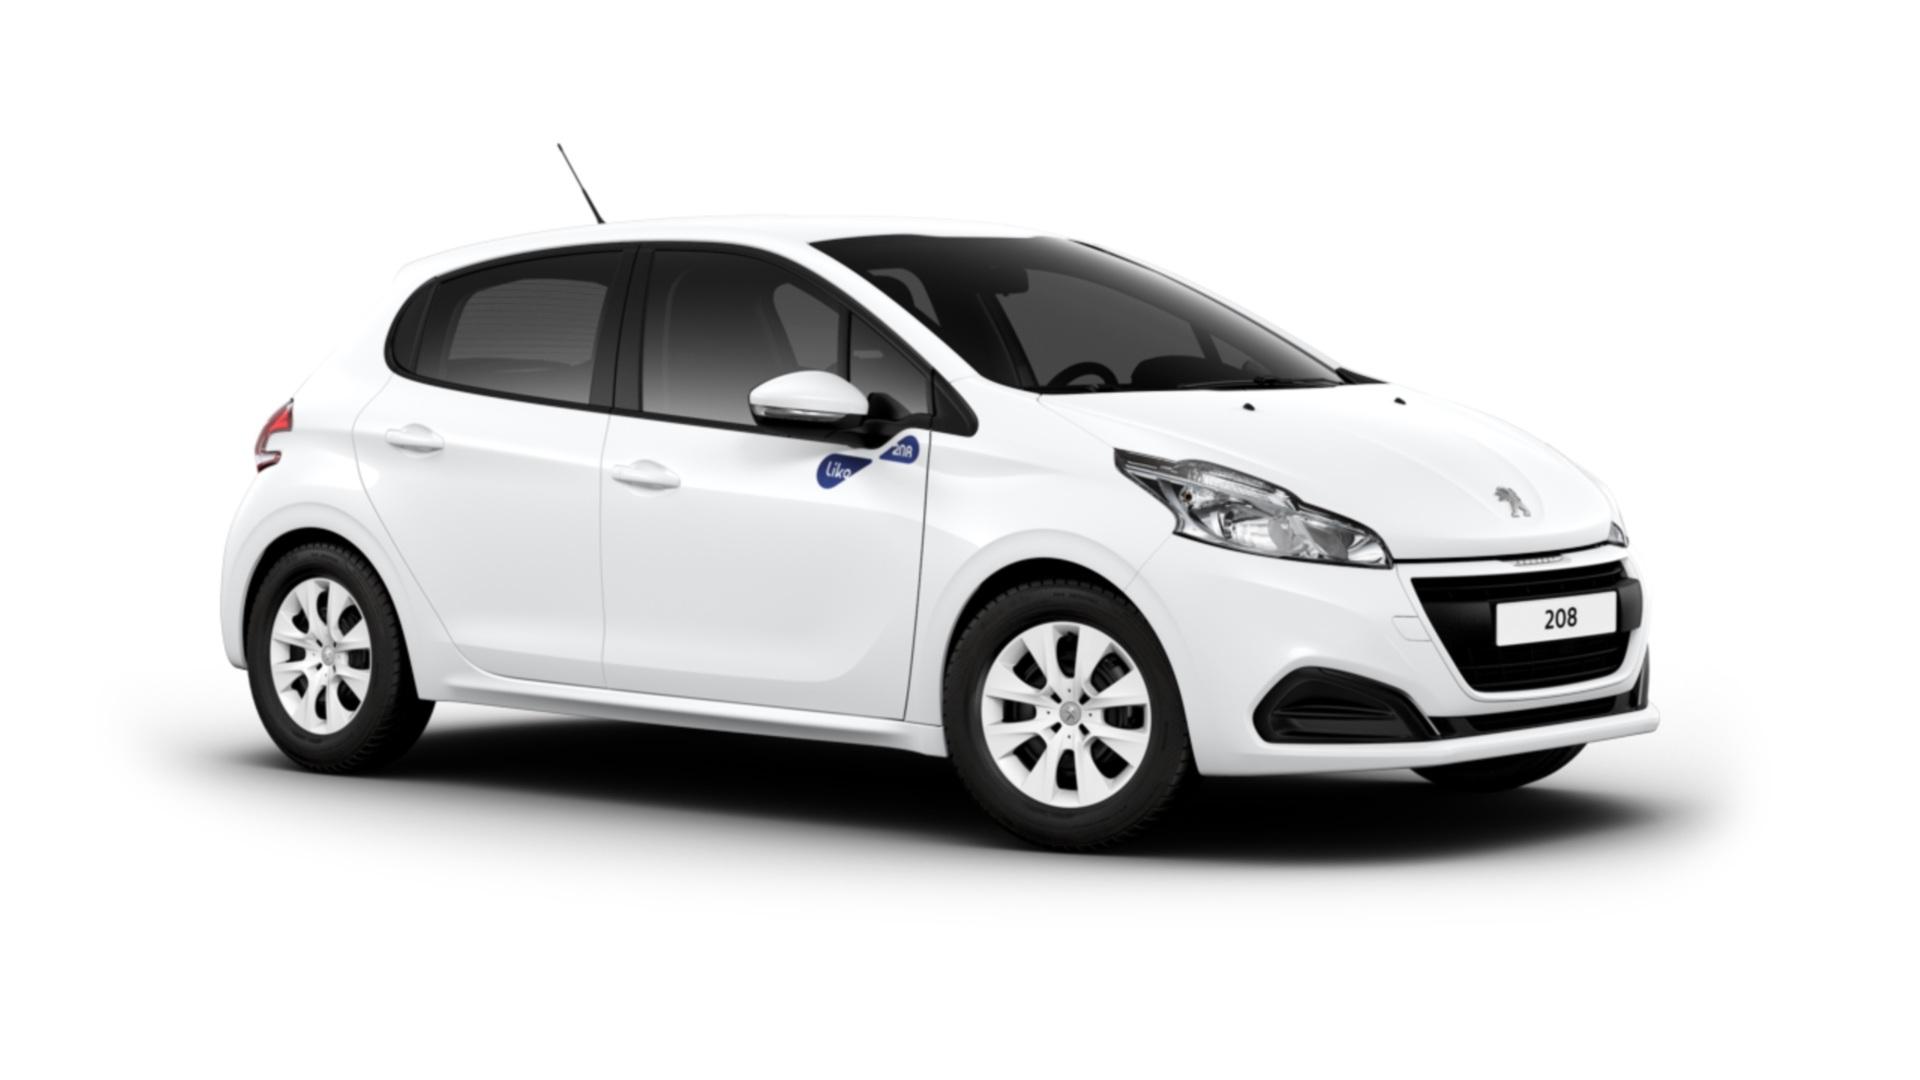 1173382 Peugeot 208 2015 020 Fr 1